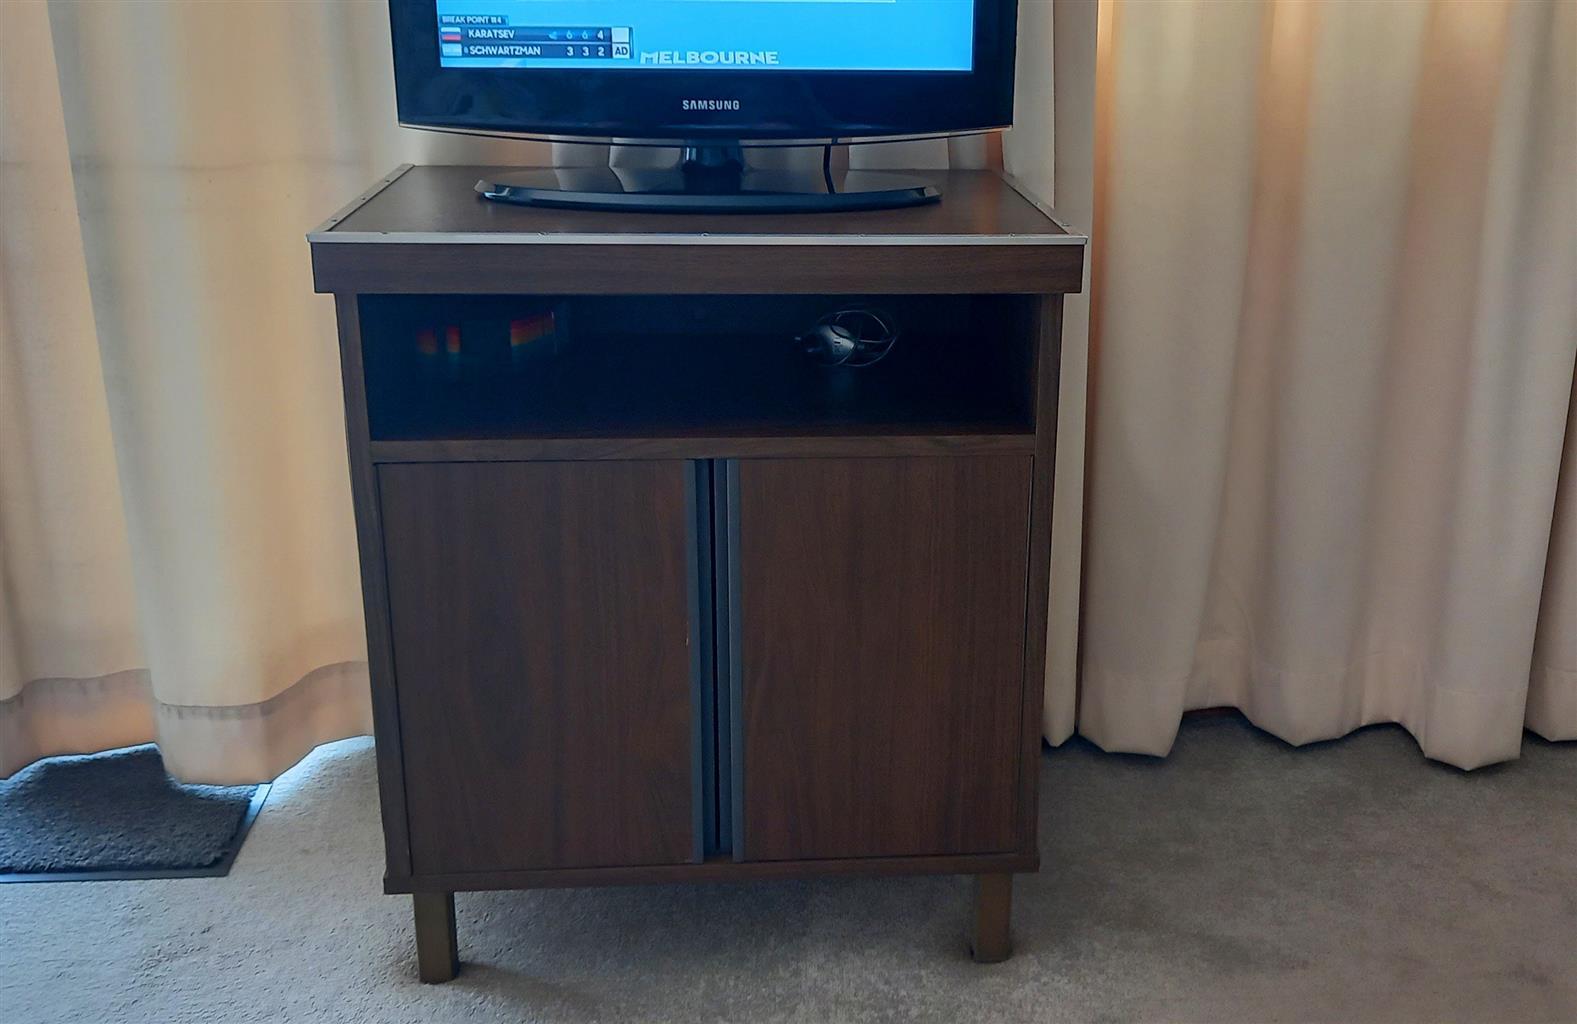 22 inch SAMSUNG TV.